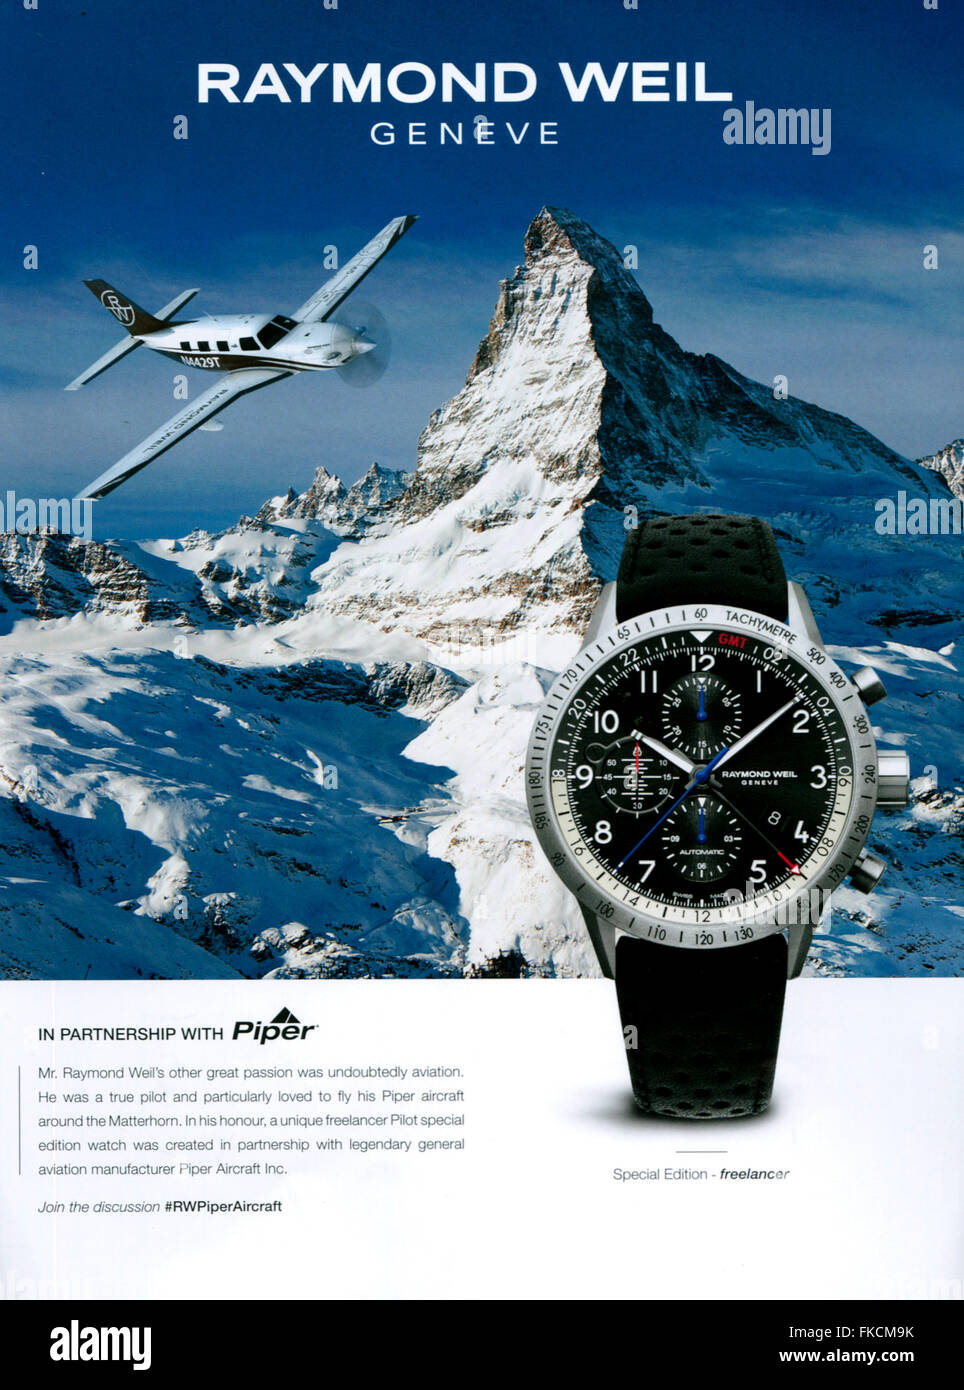 2010s UK Raymond Weil Magazine Advert - Stock Image